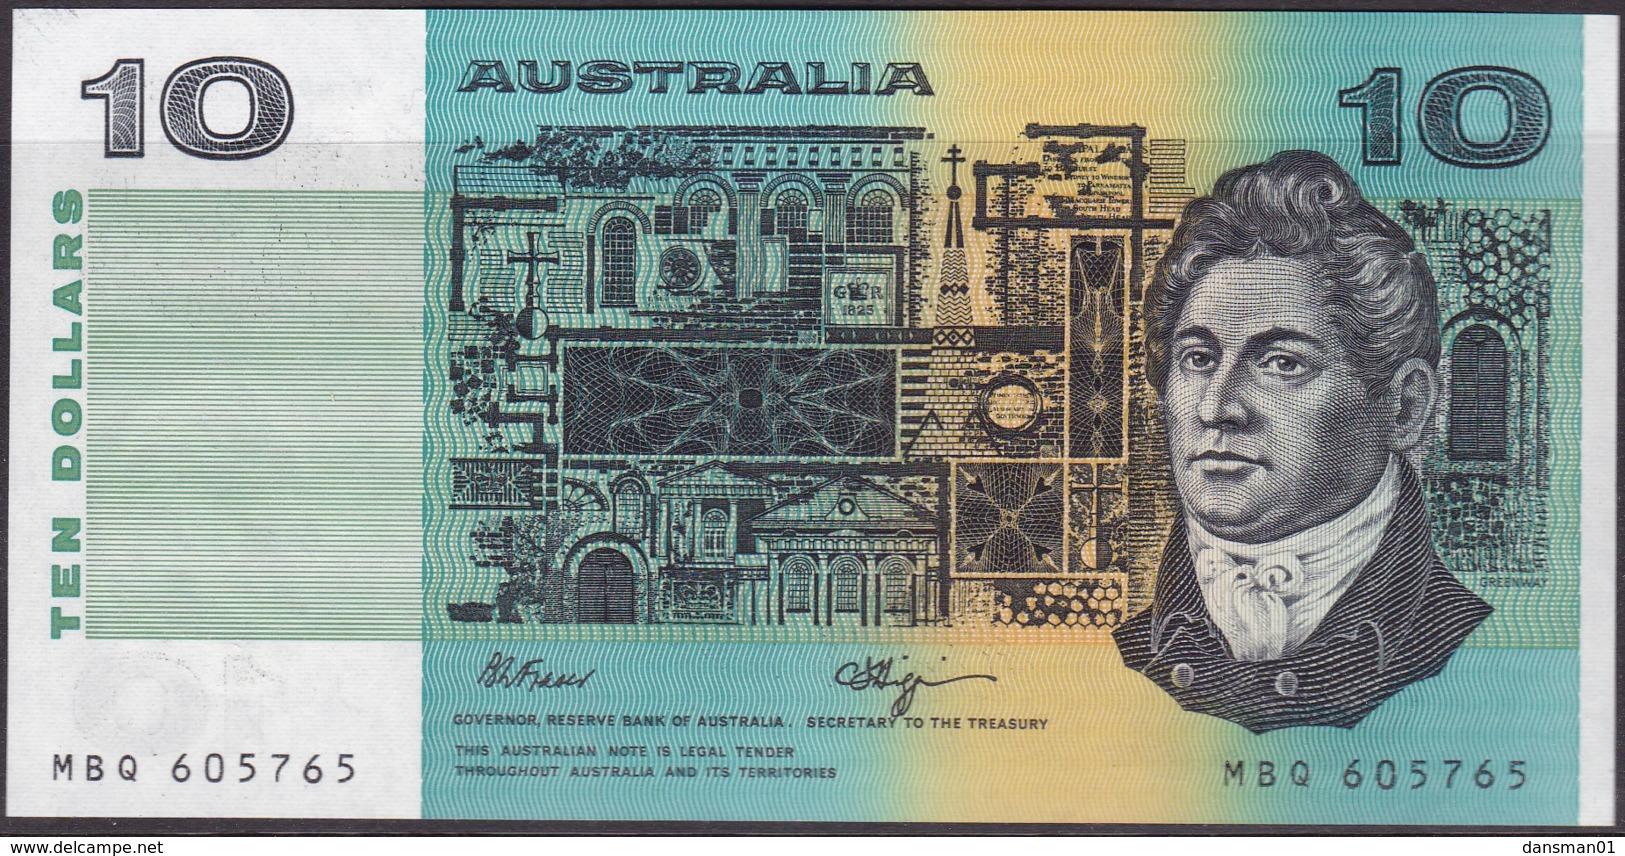 Australia $10 Fraser - Higgins Uncirculated MBQ605765 - Decimal Government Issues 1966-...